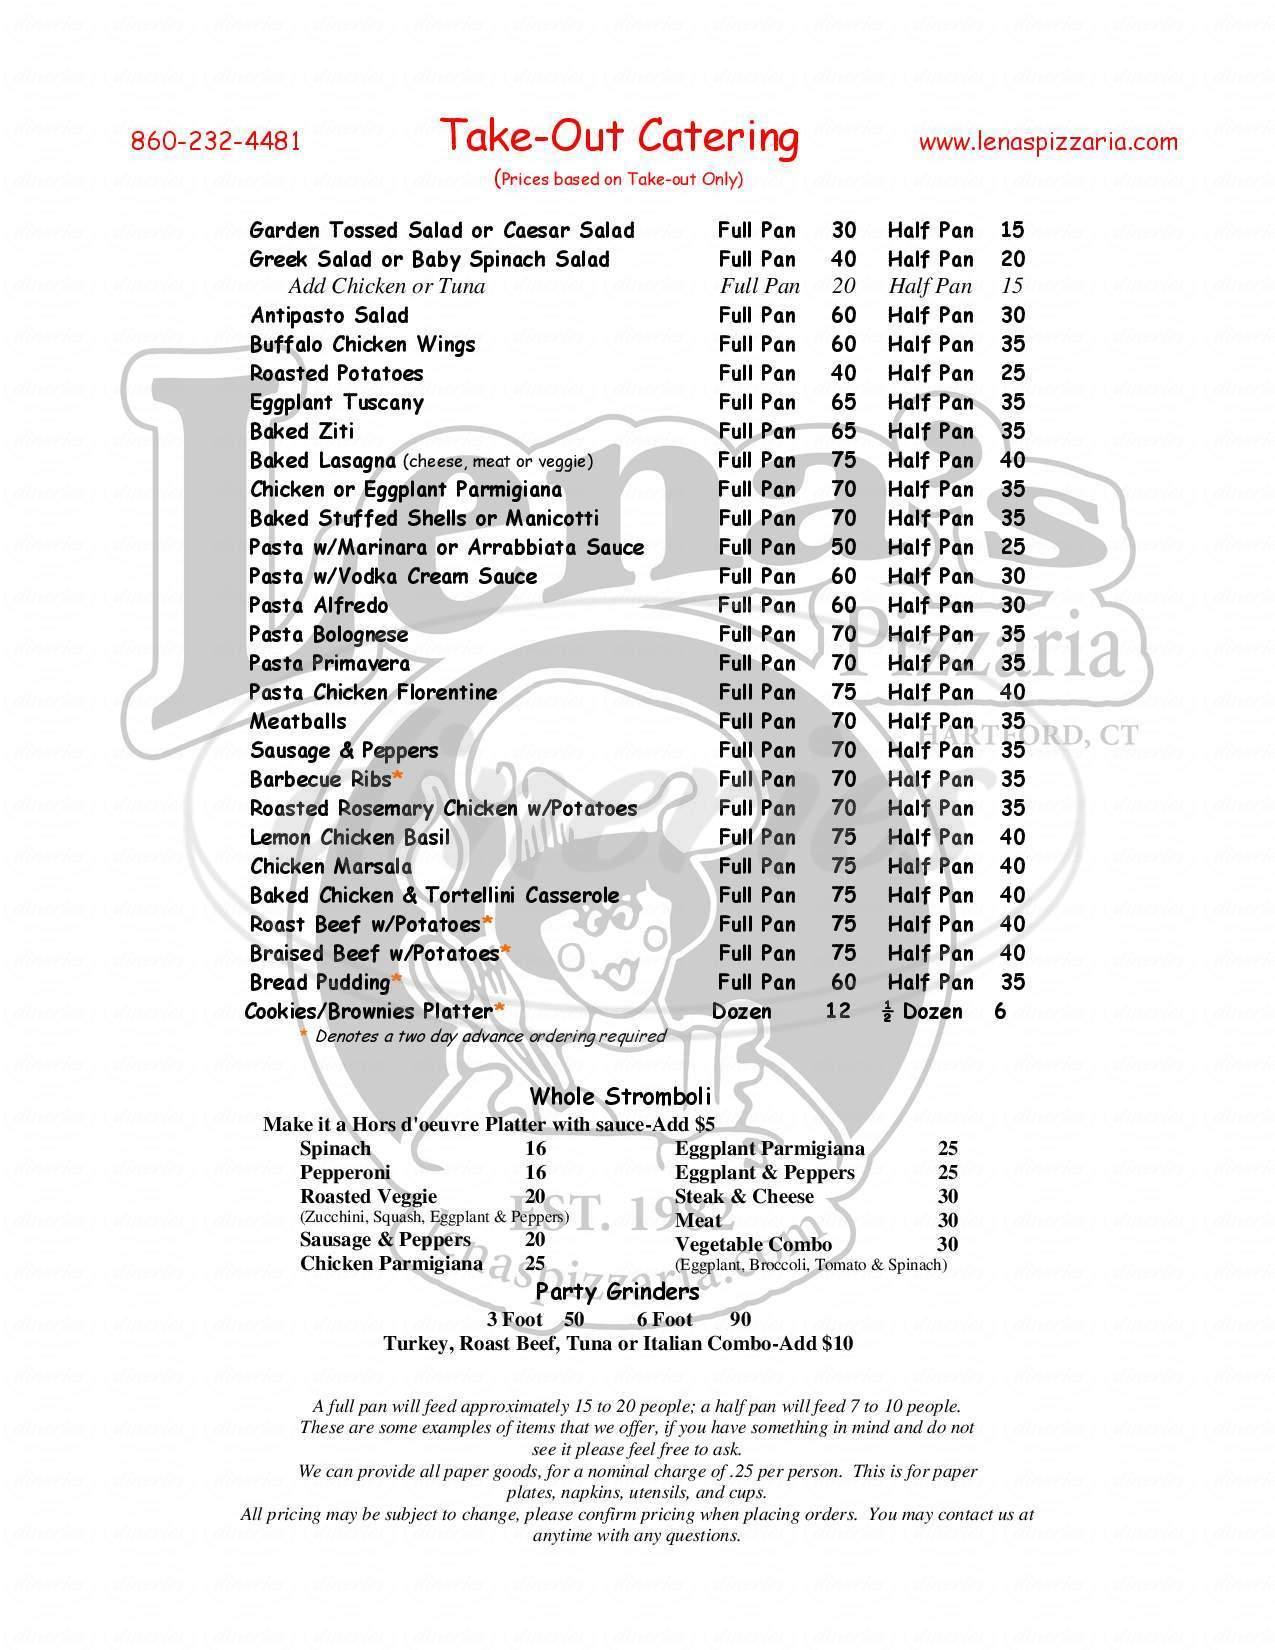 menu for Lena's First & Last Pizzeria